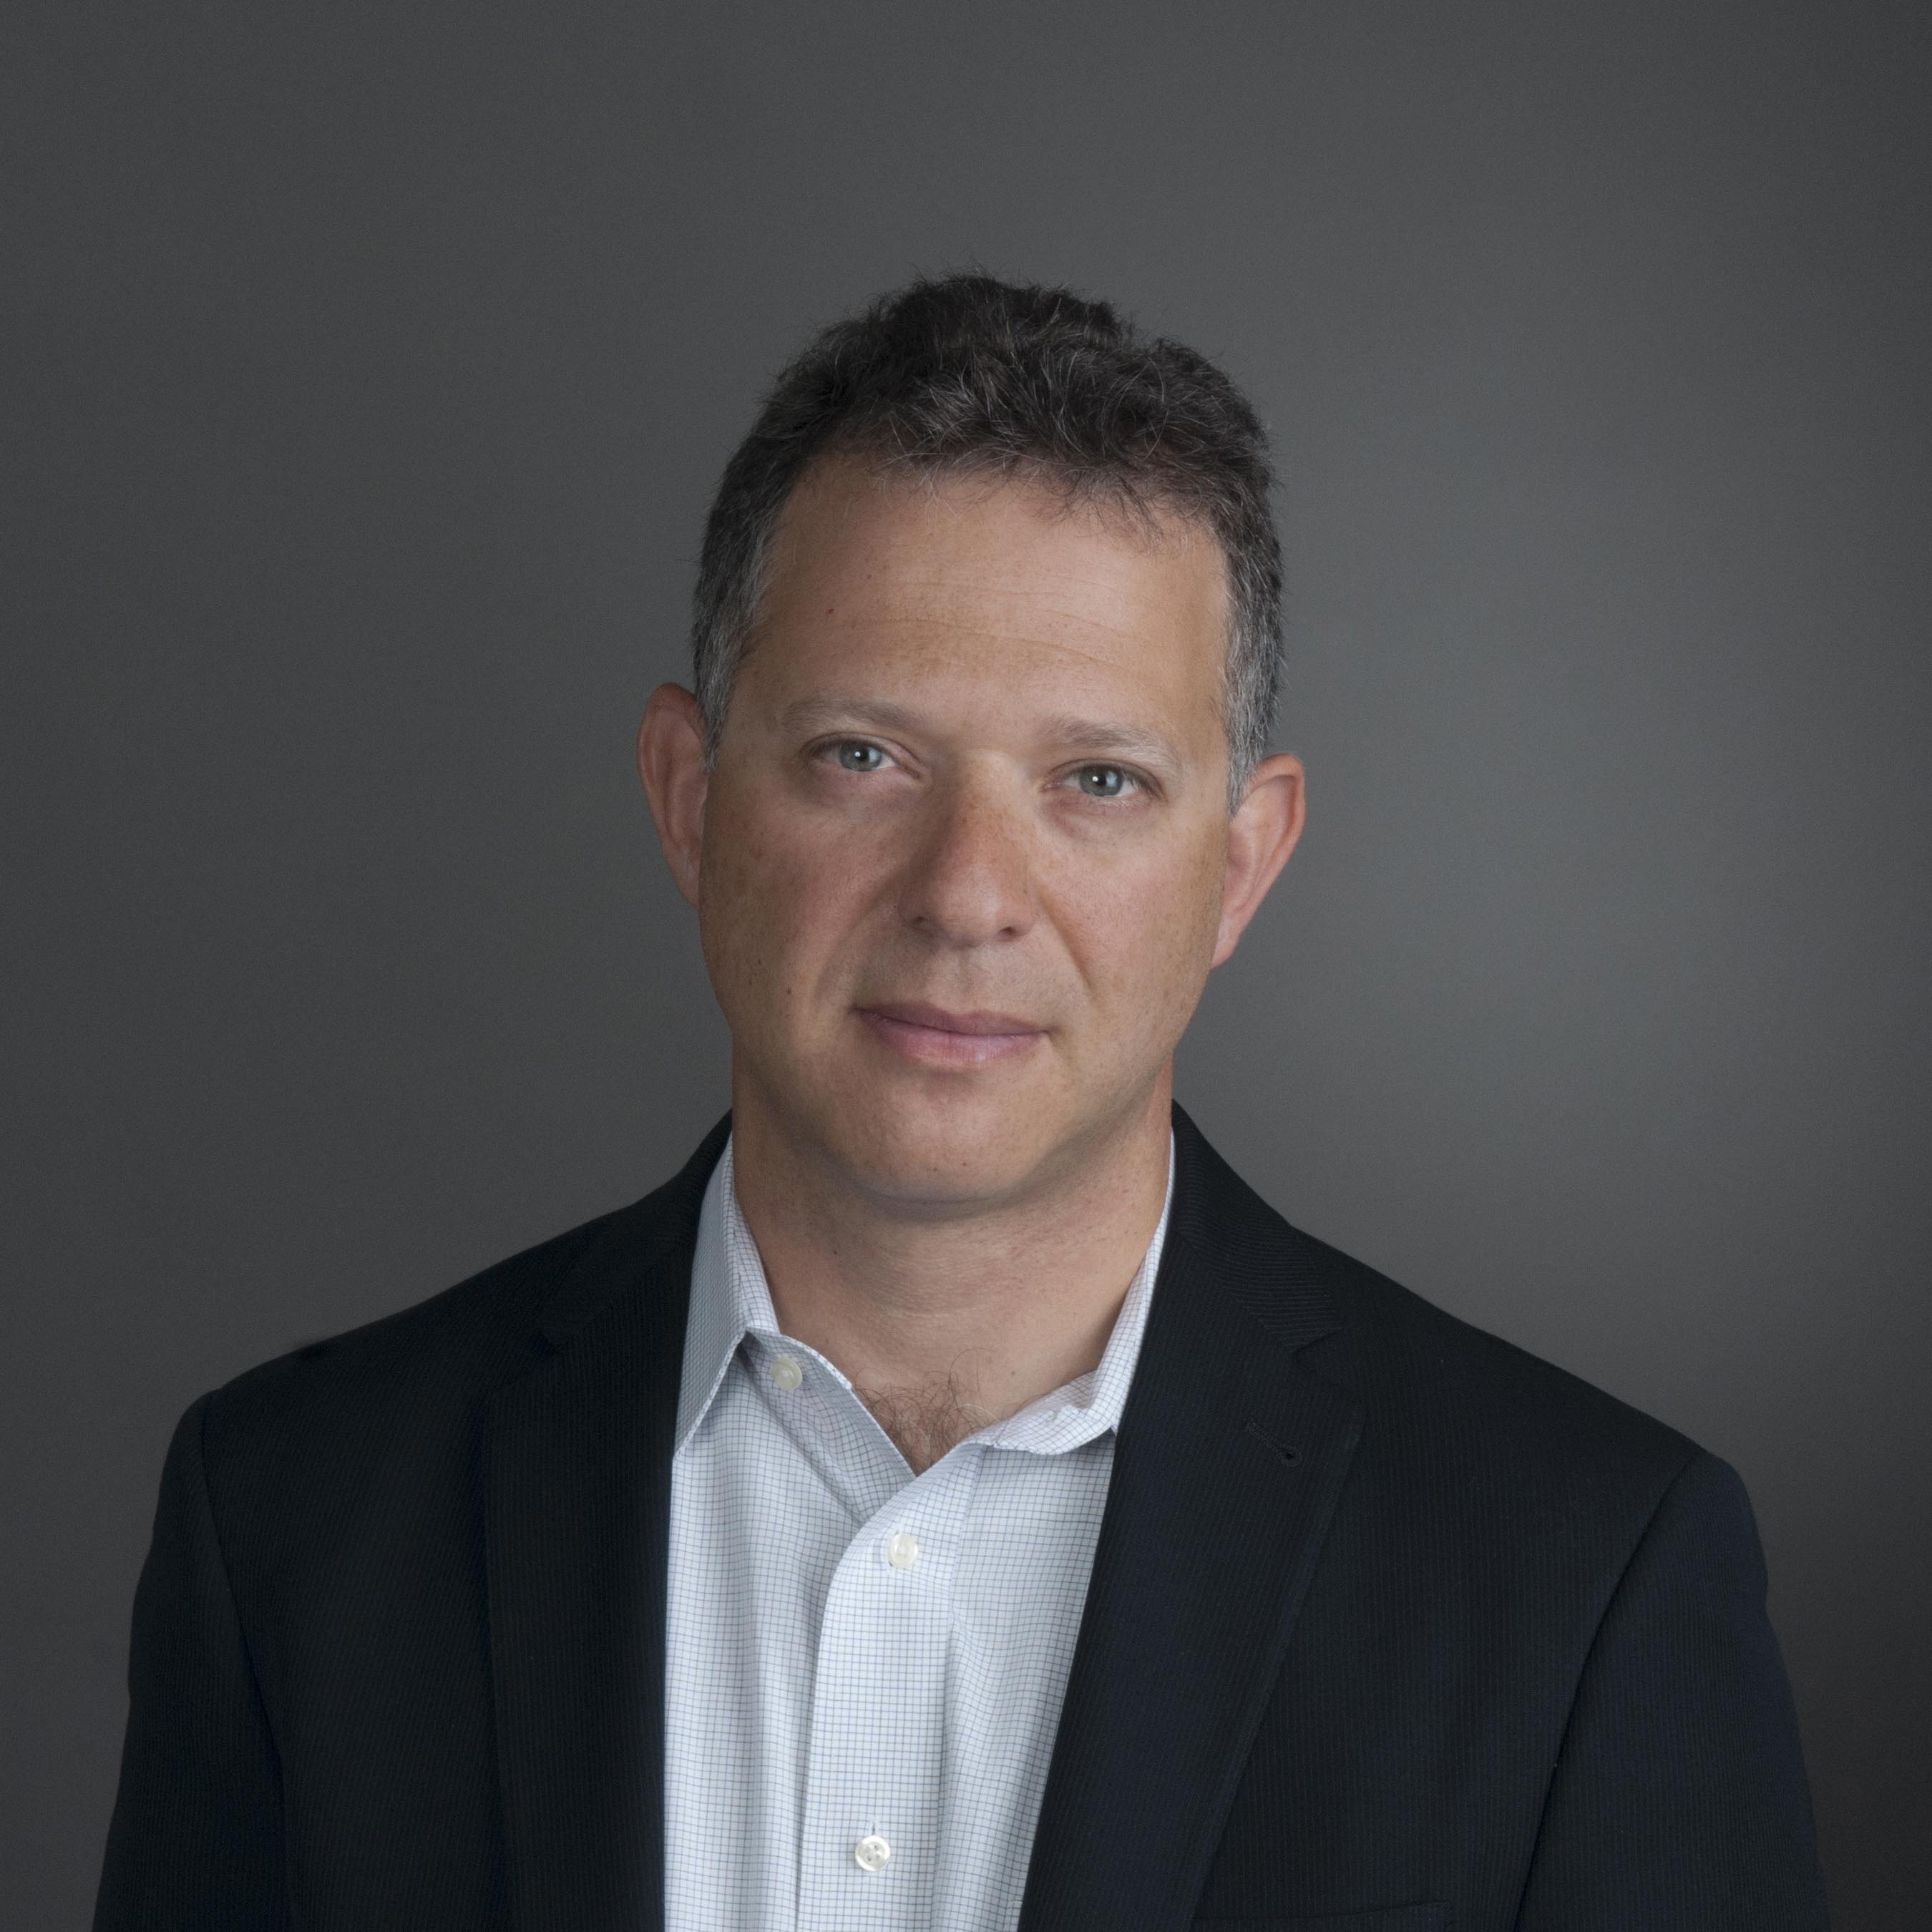 Isaac Sacolick, StarCIO President